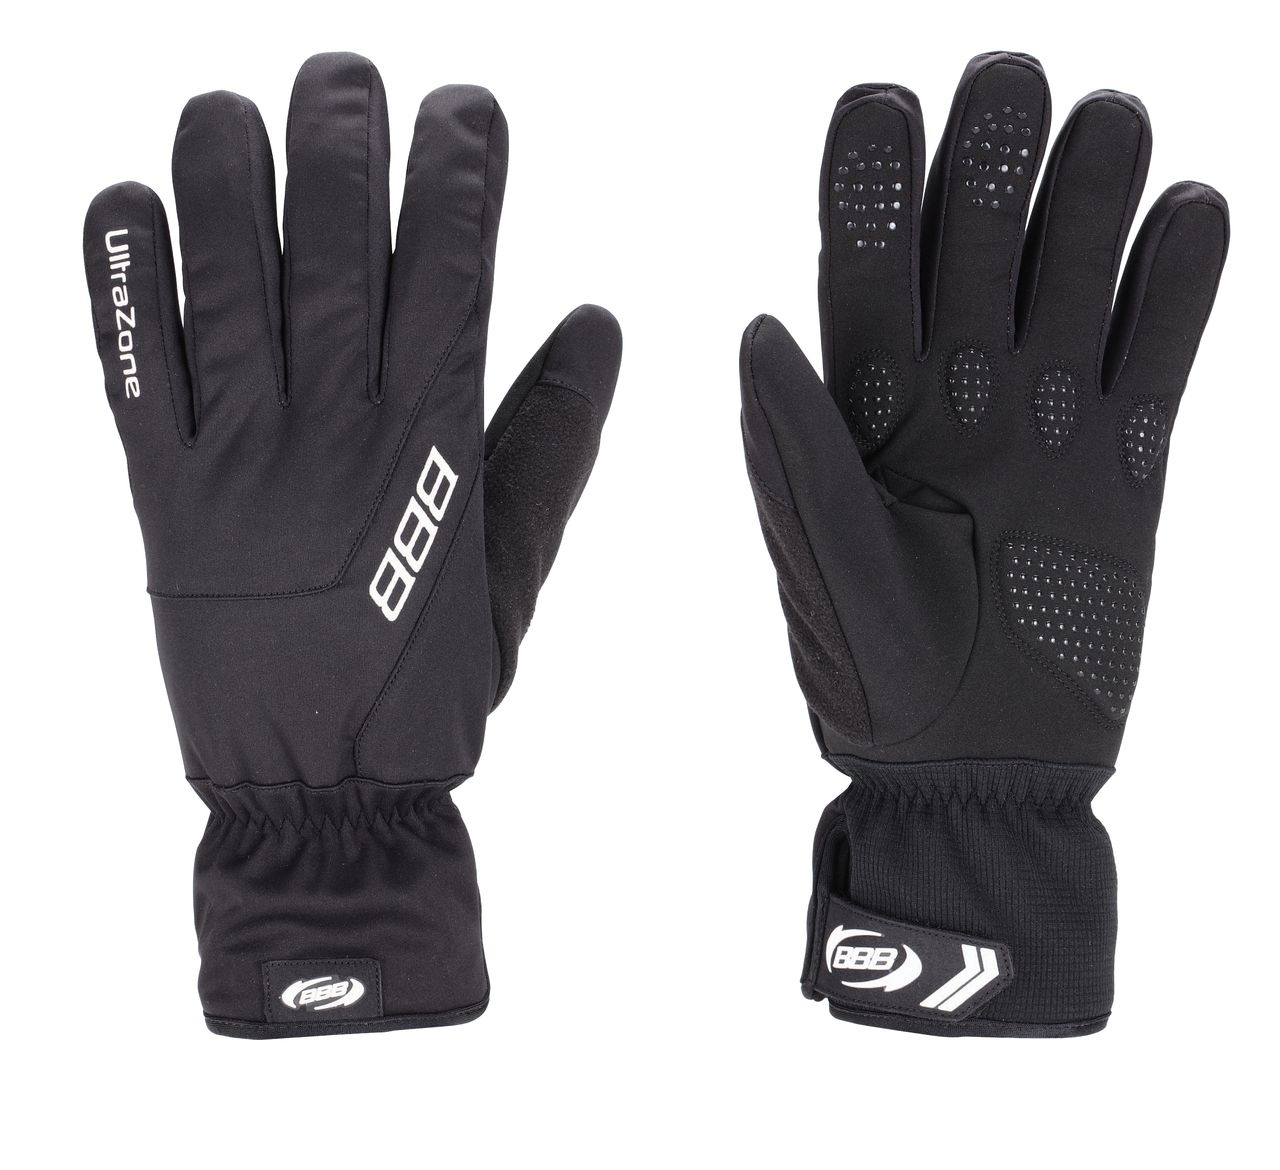 Gants d'hiver BBB UltraZone (Noir) - BWG-24 - S